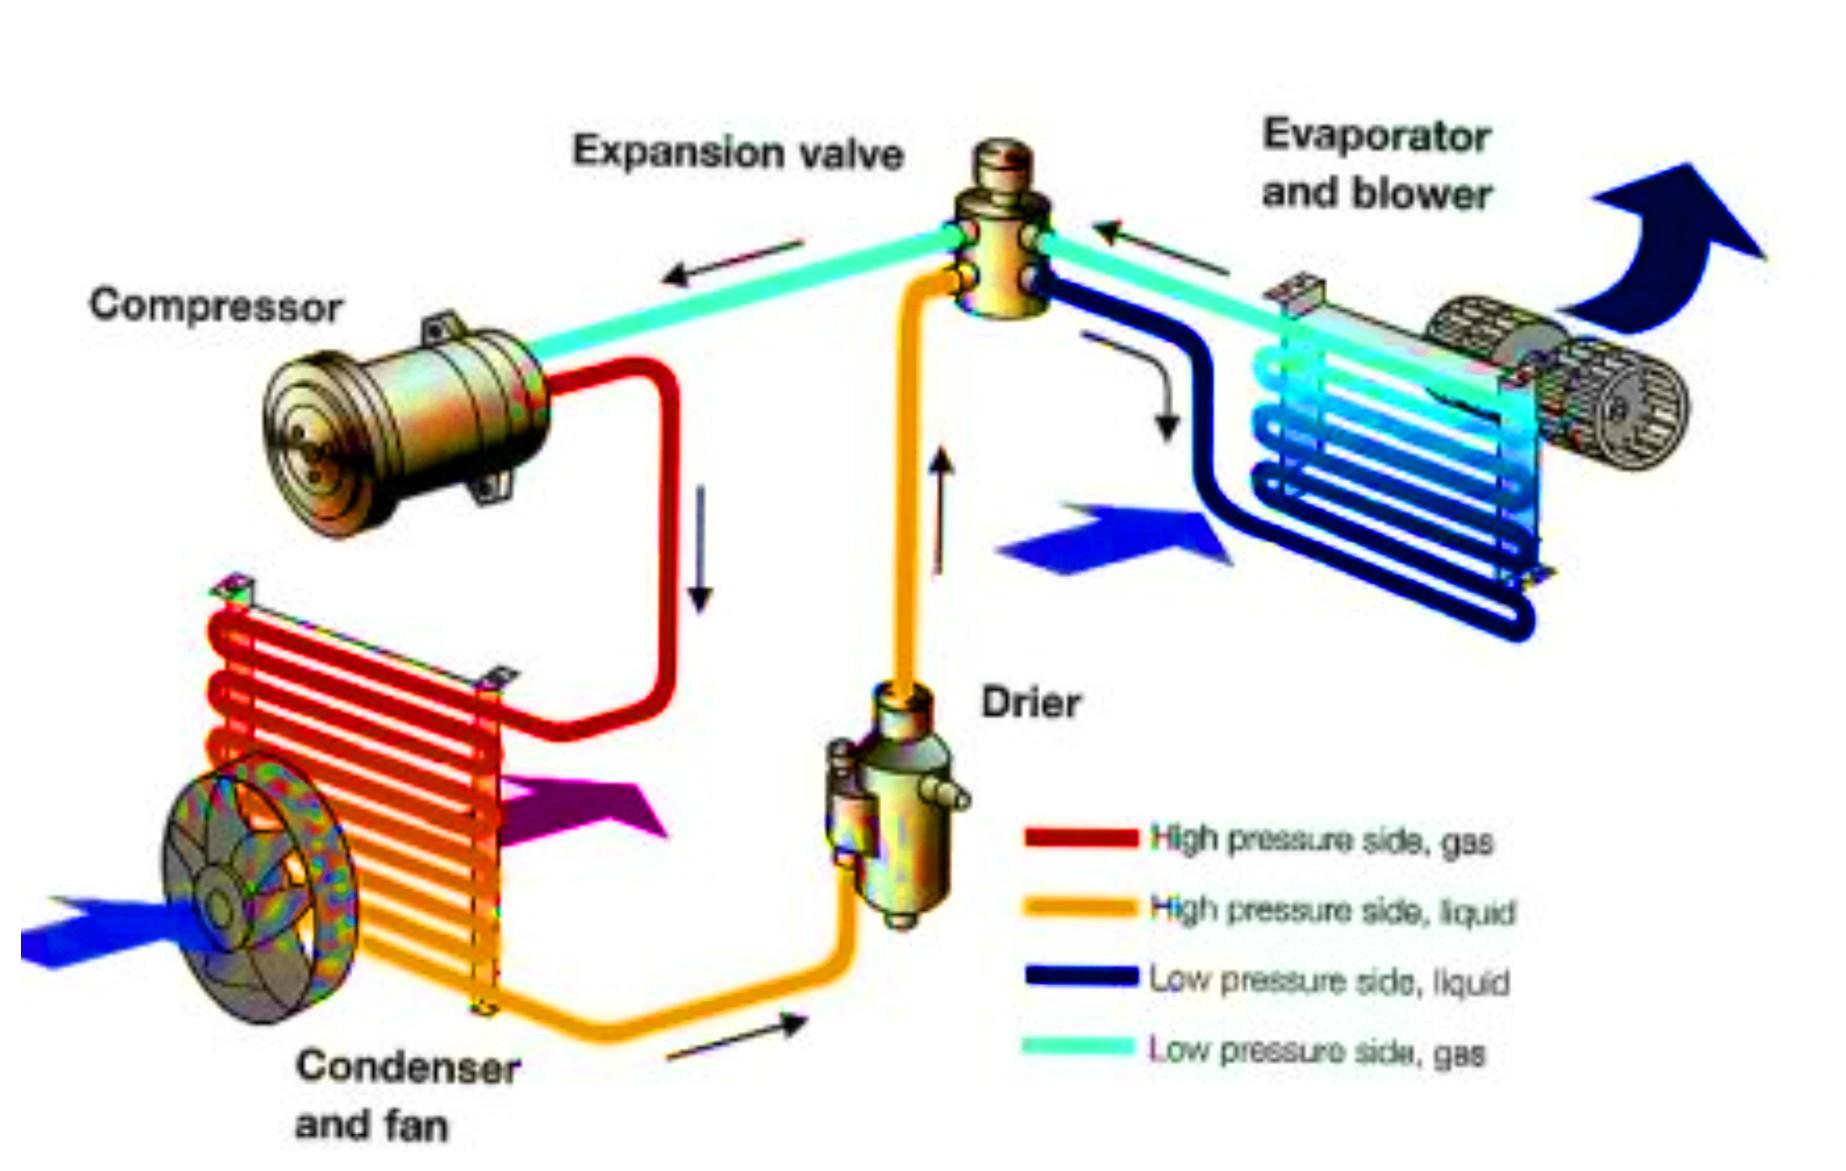 Auto Air Condition System Diagram Car Car A C Pressor Wiring Diagram Auto Air Conditioning Of Auto Air Condition System Diagram